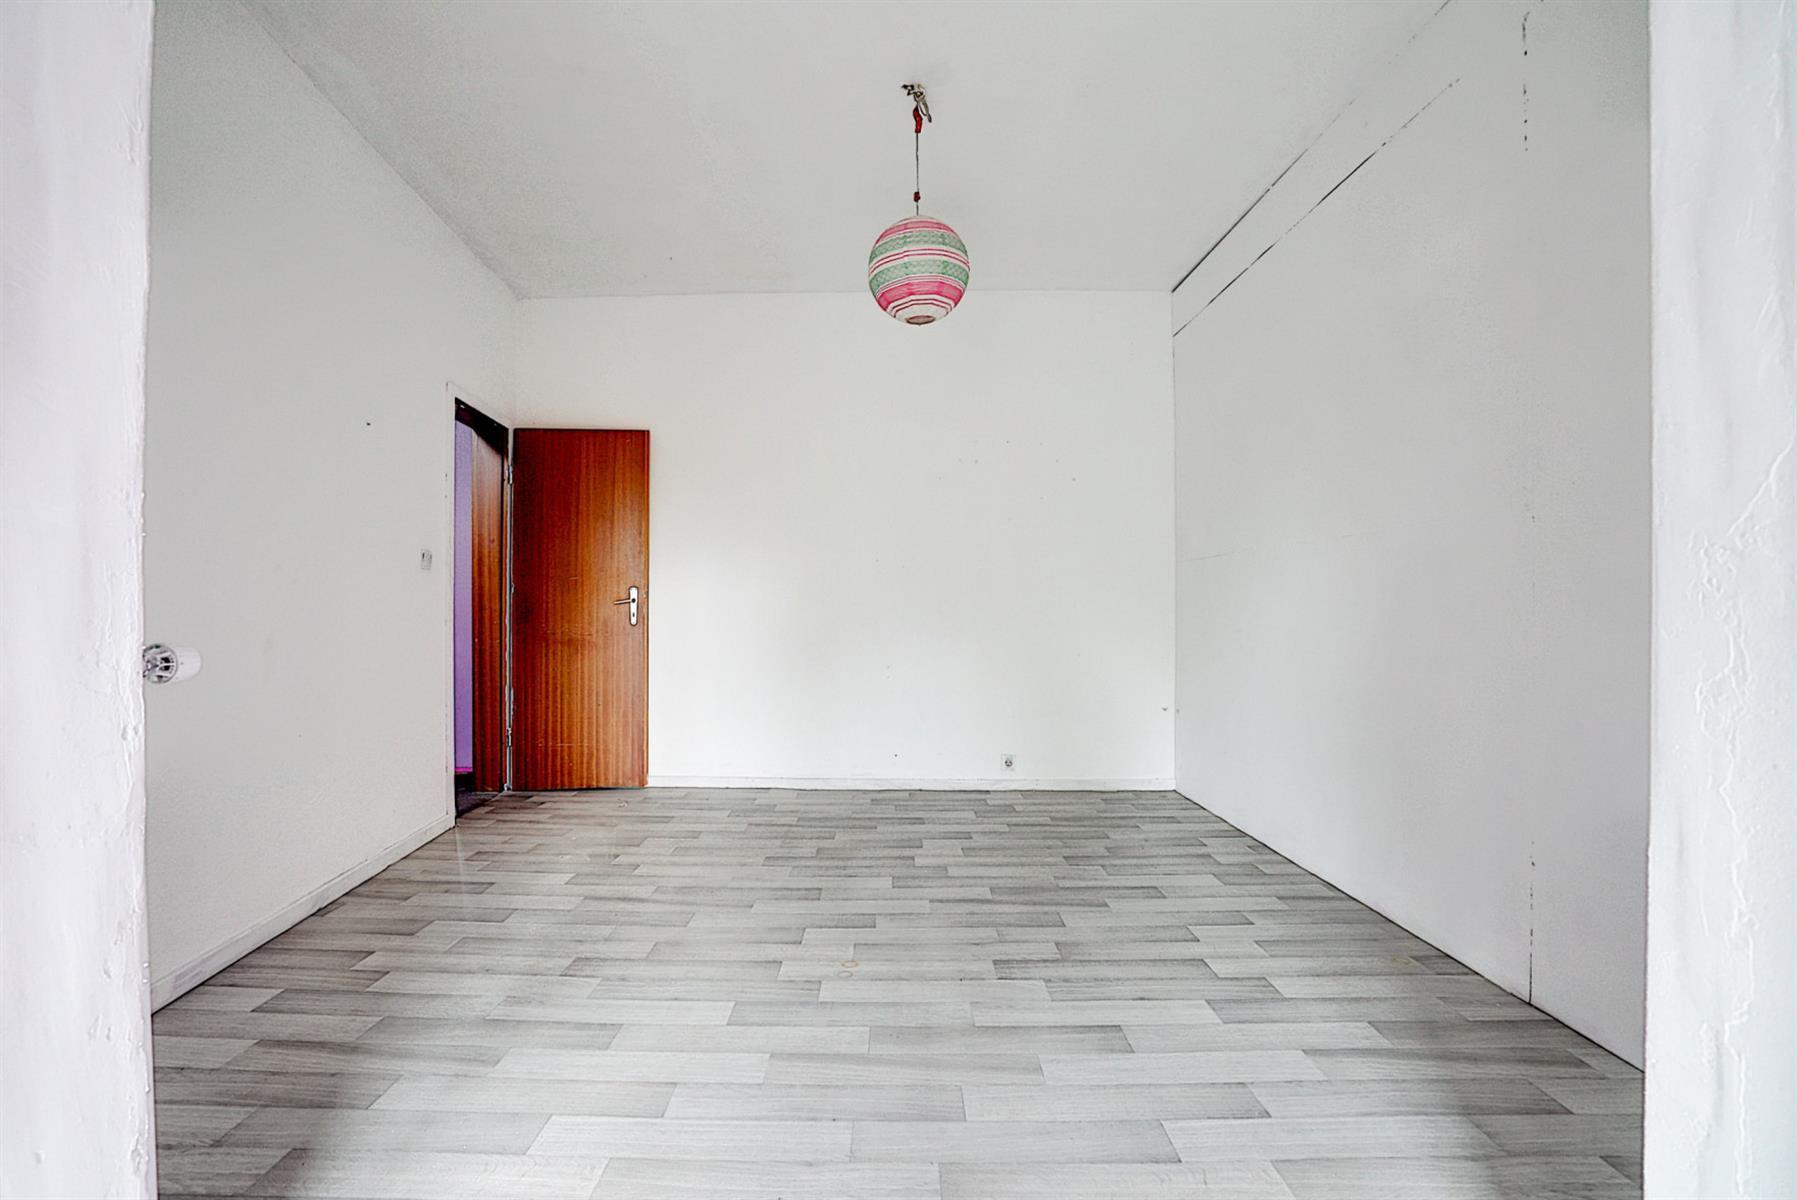 Maison - Saint-nicolas - #4357054-10